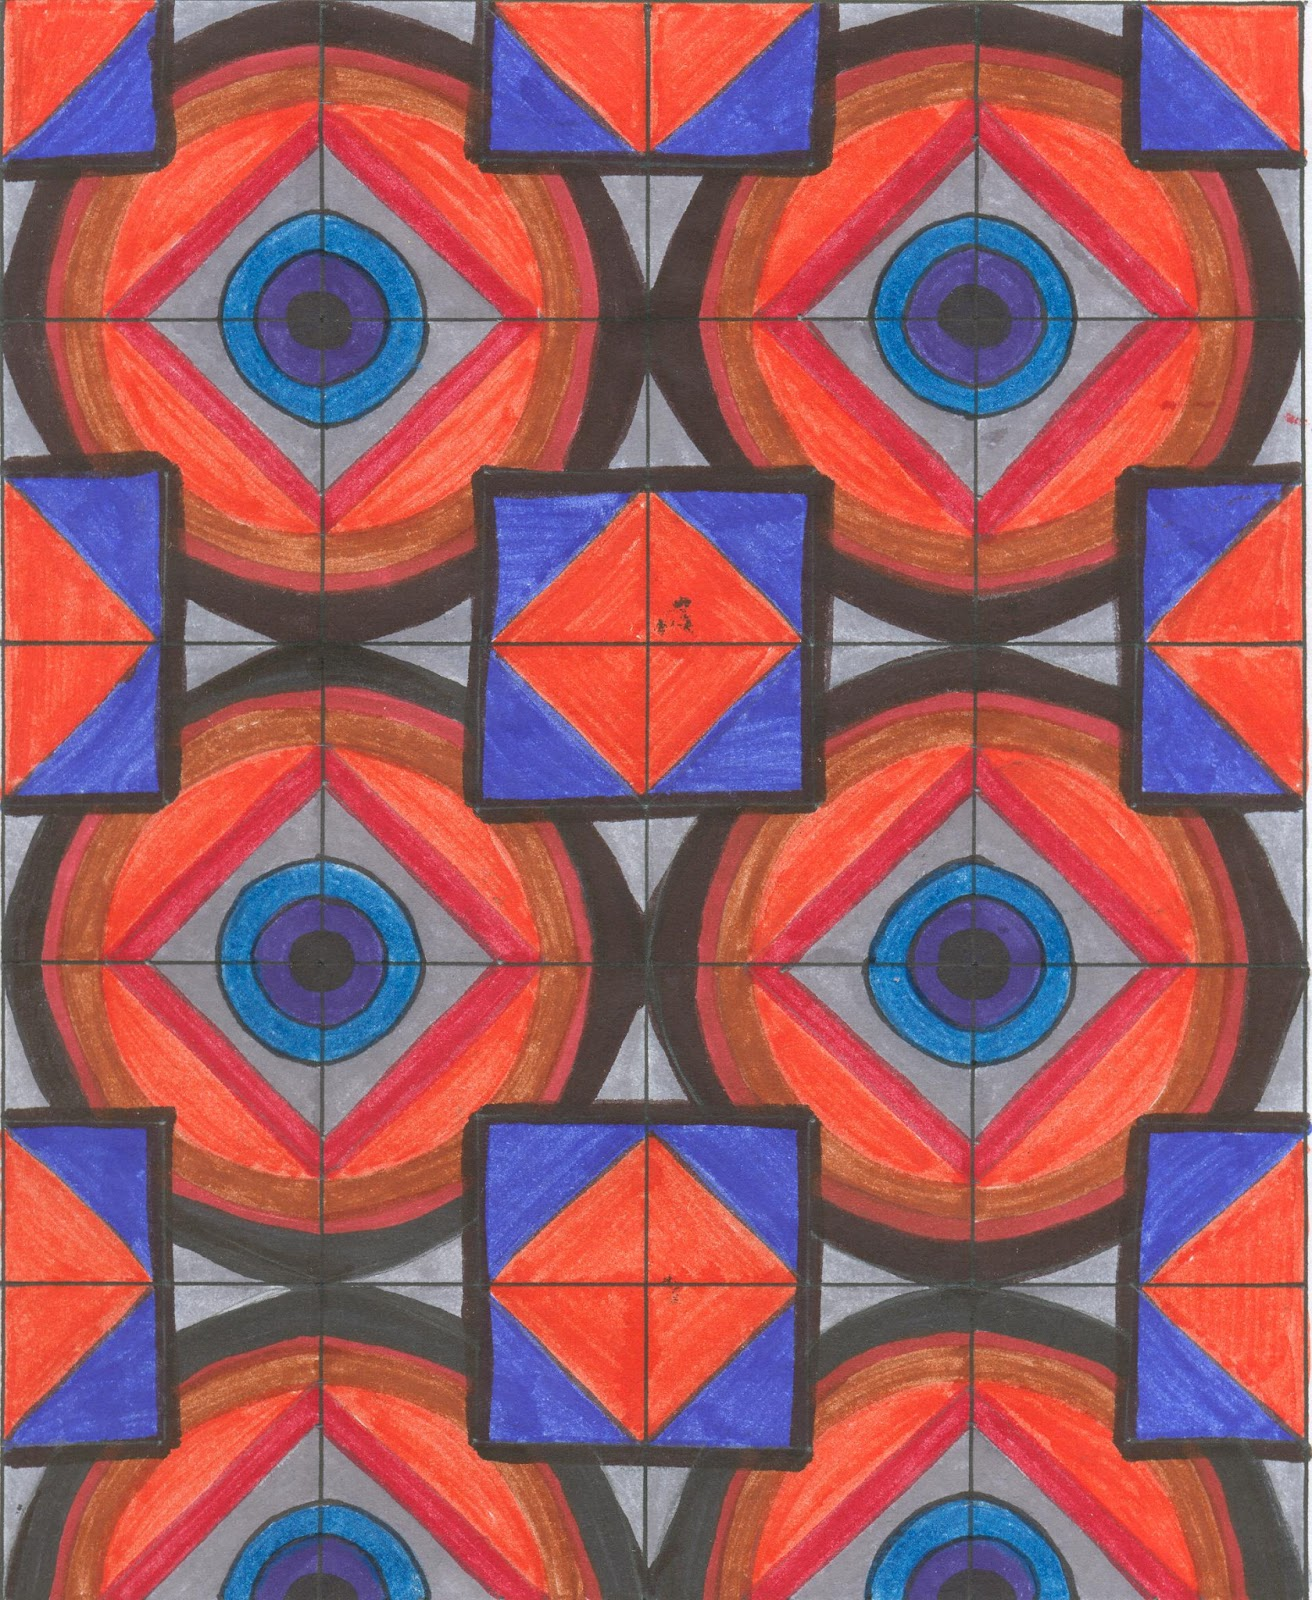 diseo modular en una red cuadrada - Diseos Modulares